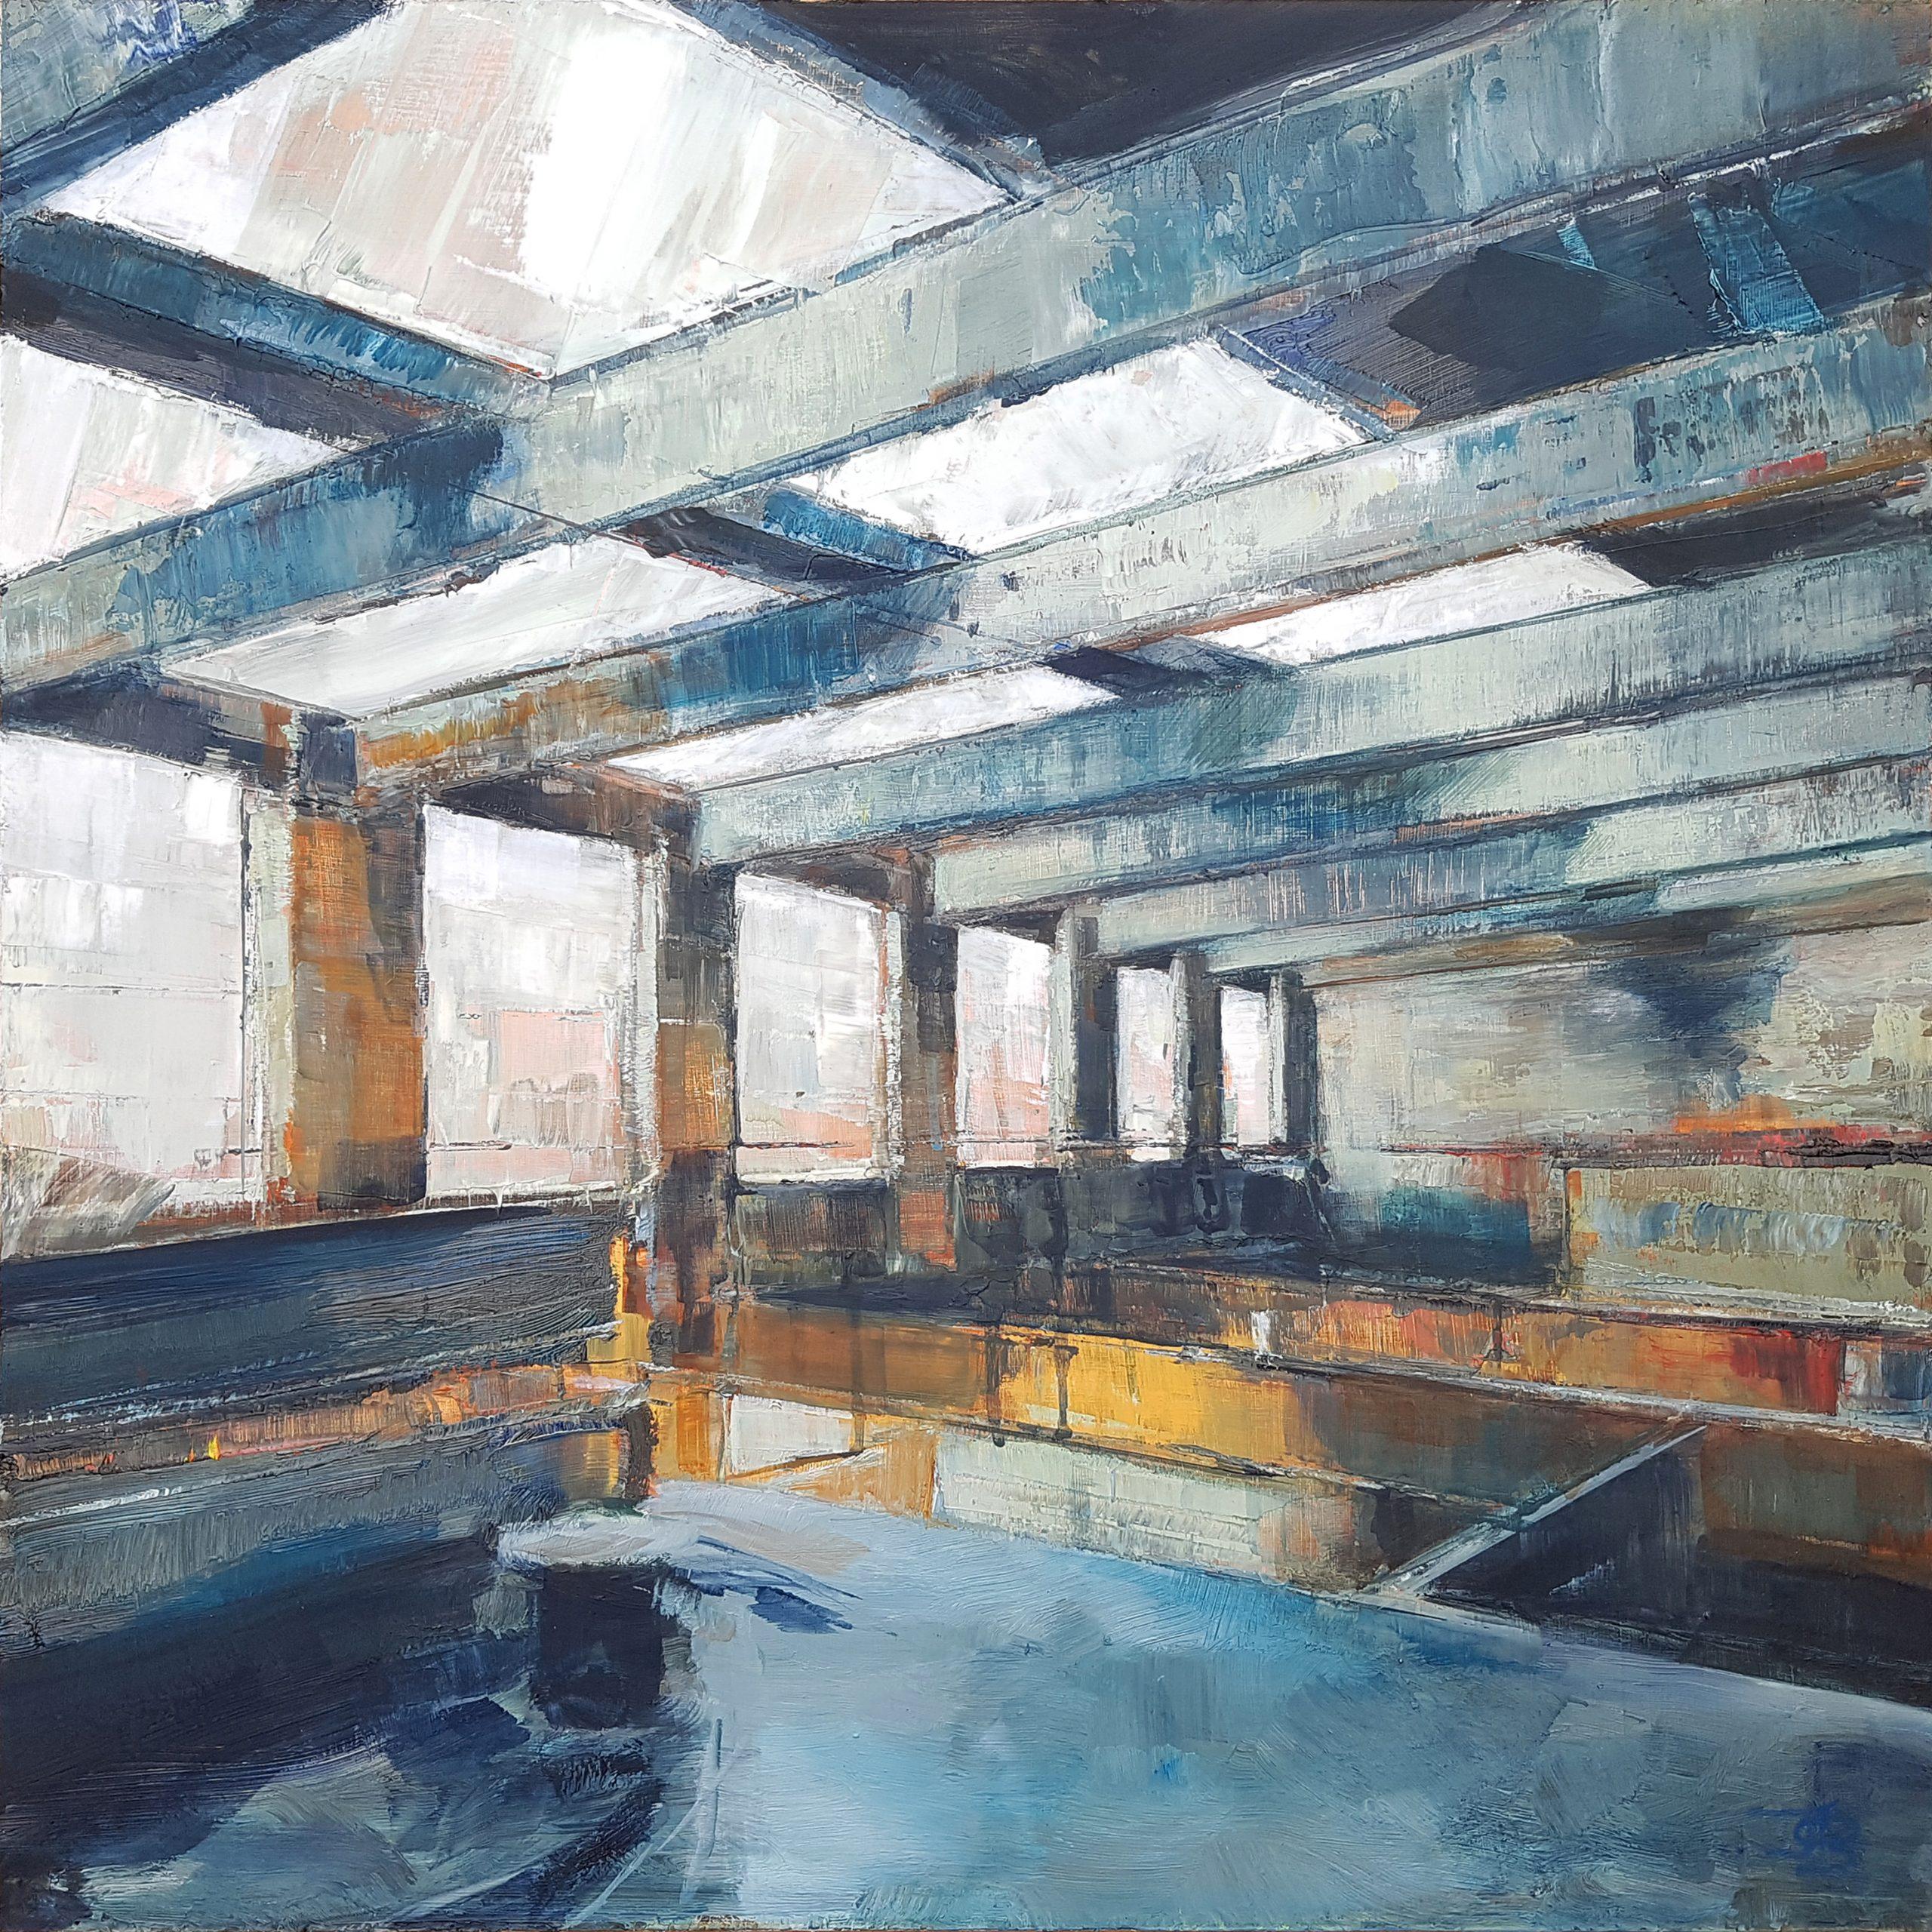 Edge, 2020, Oil on board, 45 x 45cm | Julia Brown